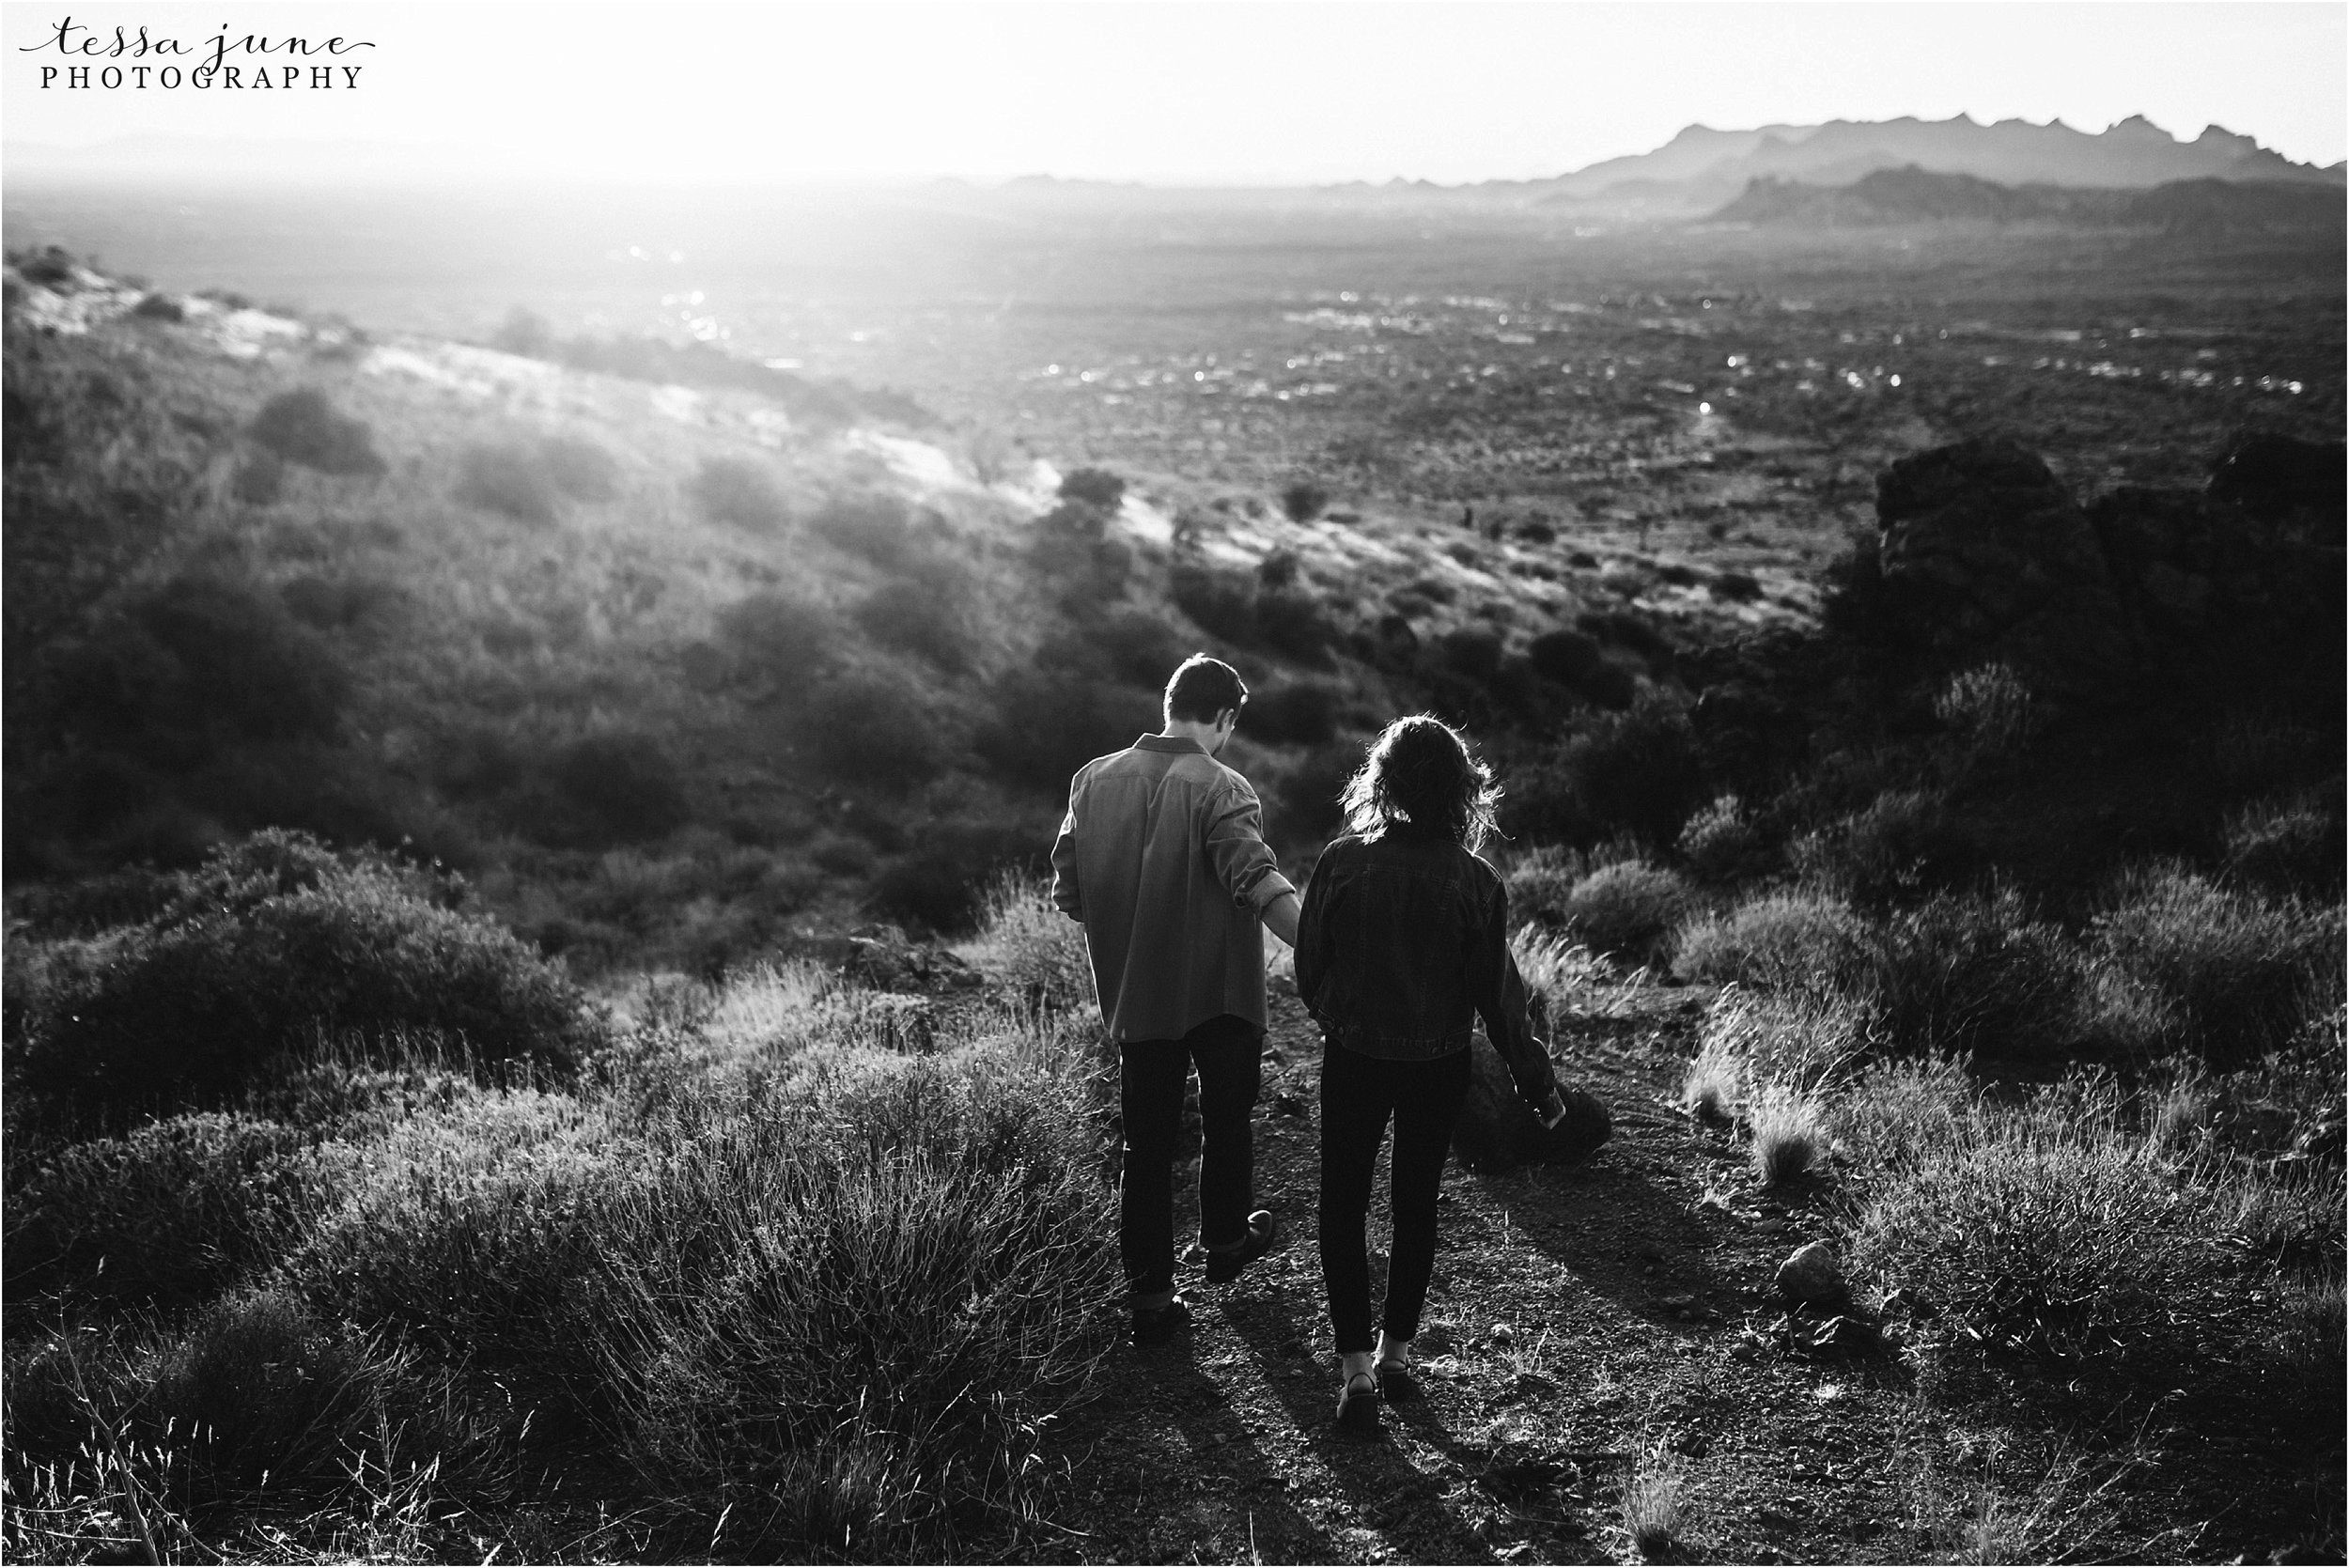 lost-dutchman-state-park-engagement-arizona-destination-photographer-phoenix-10.jpg